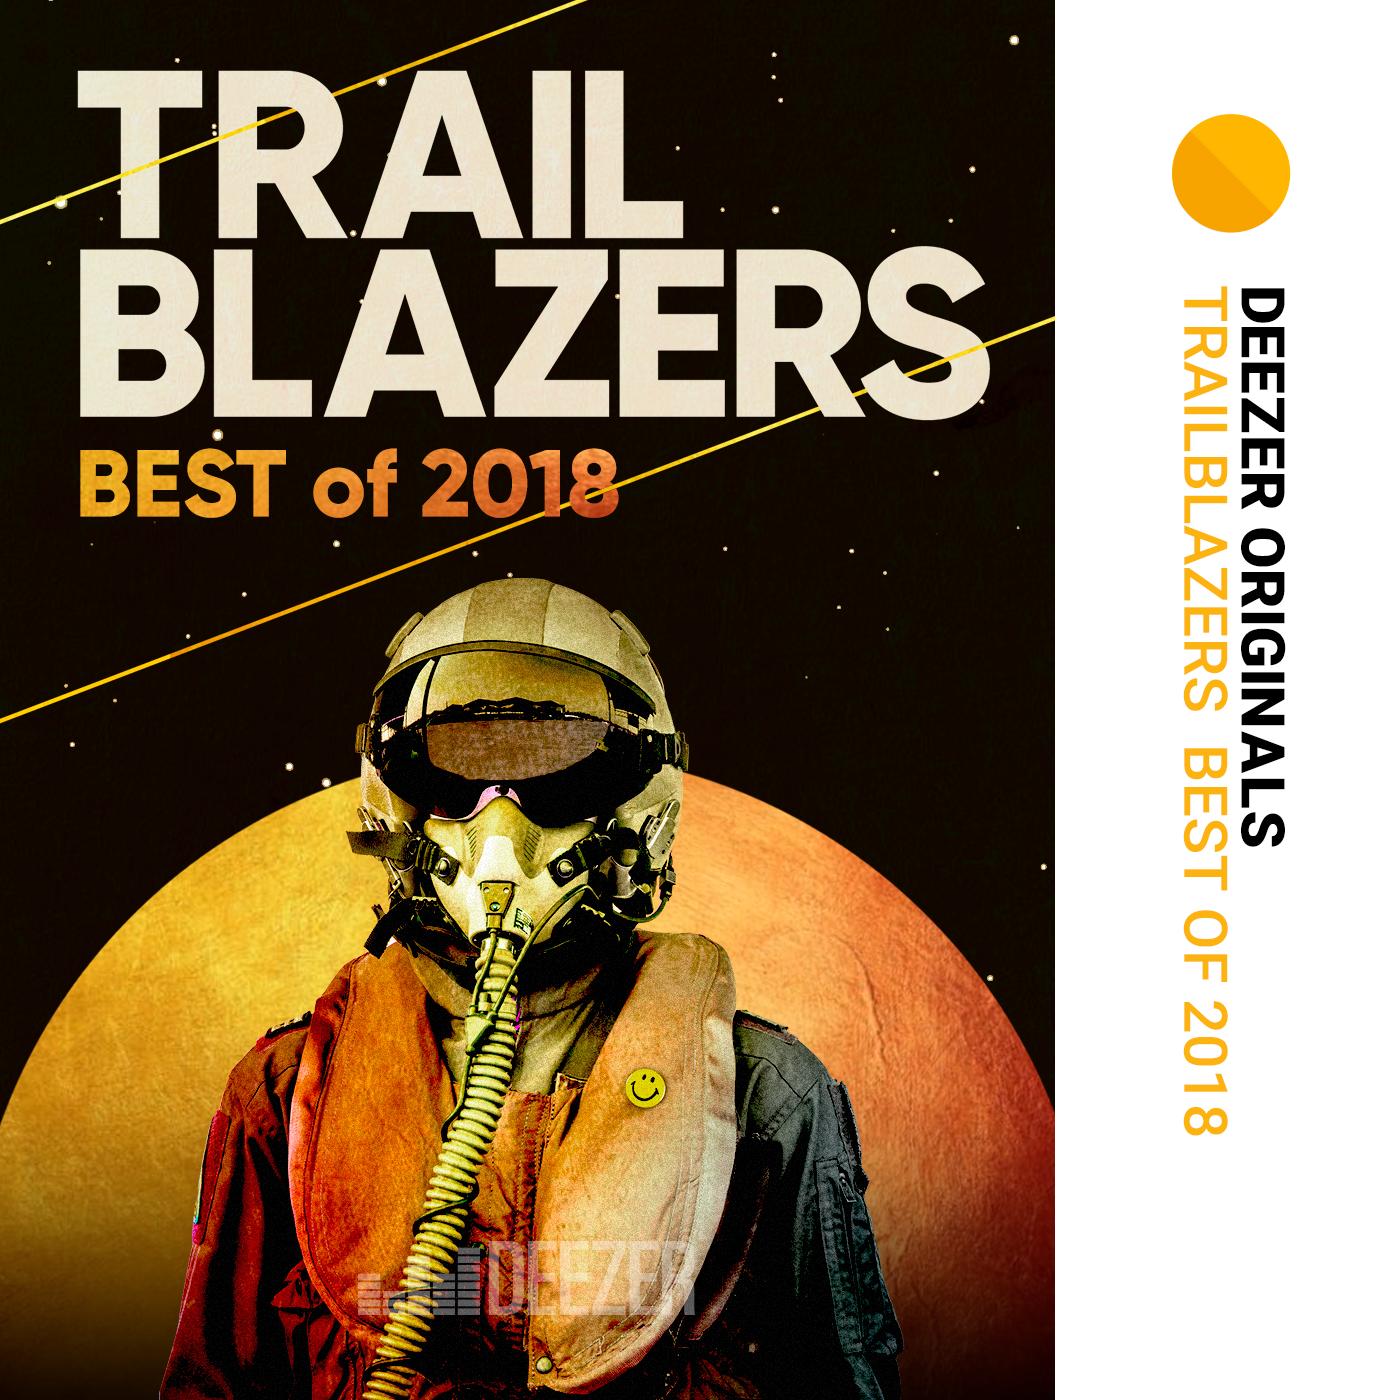 Trailblazers: Best of 2018